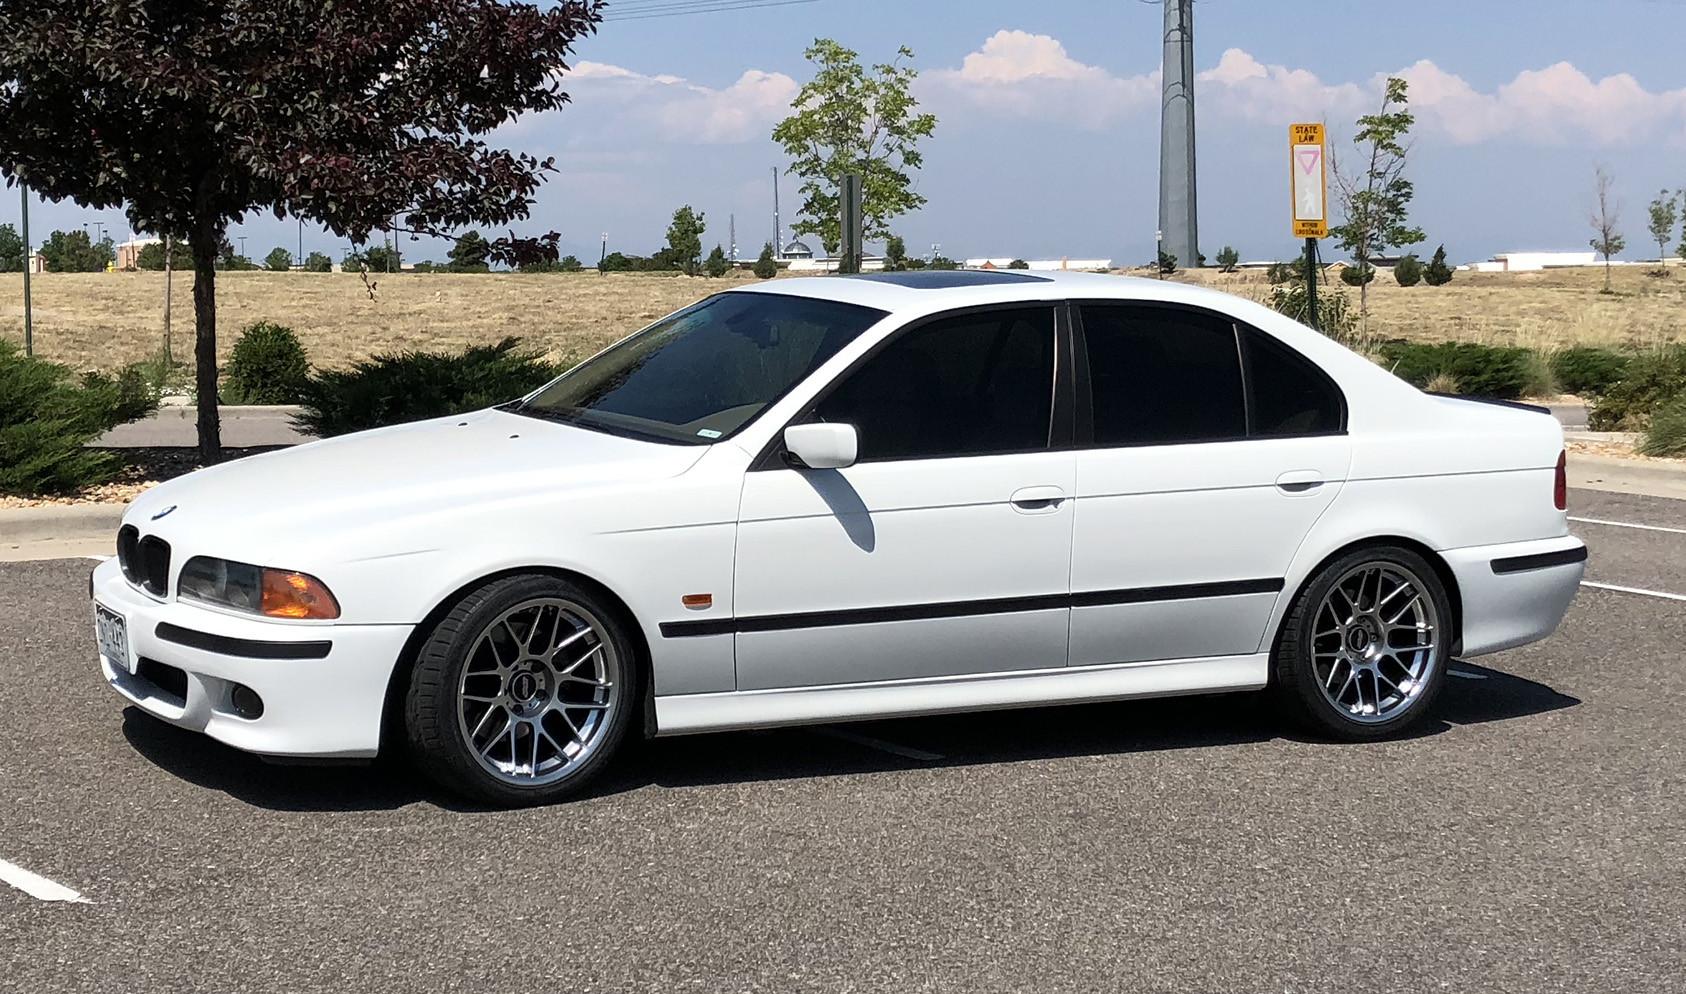 "E39 Square Fitment<br />Wheels: 18x9.5"" ET22 Hyper Black ARC-8<br />Tires: 275/35-18 Kuhmo Ecsta PS31<br />Mods: 5mm front spacers"